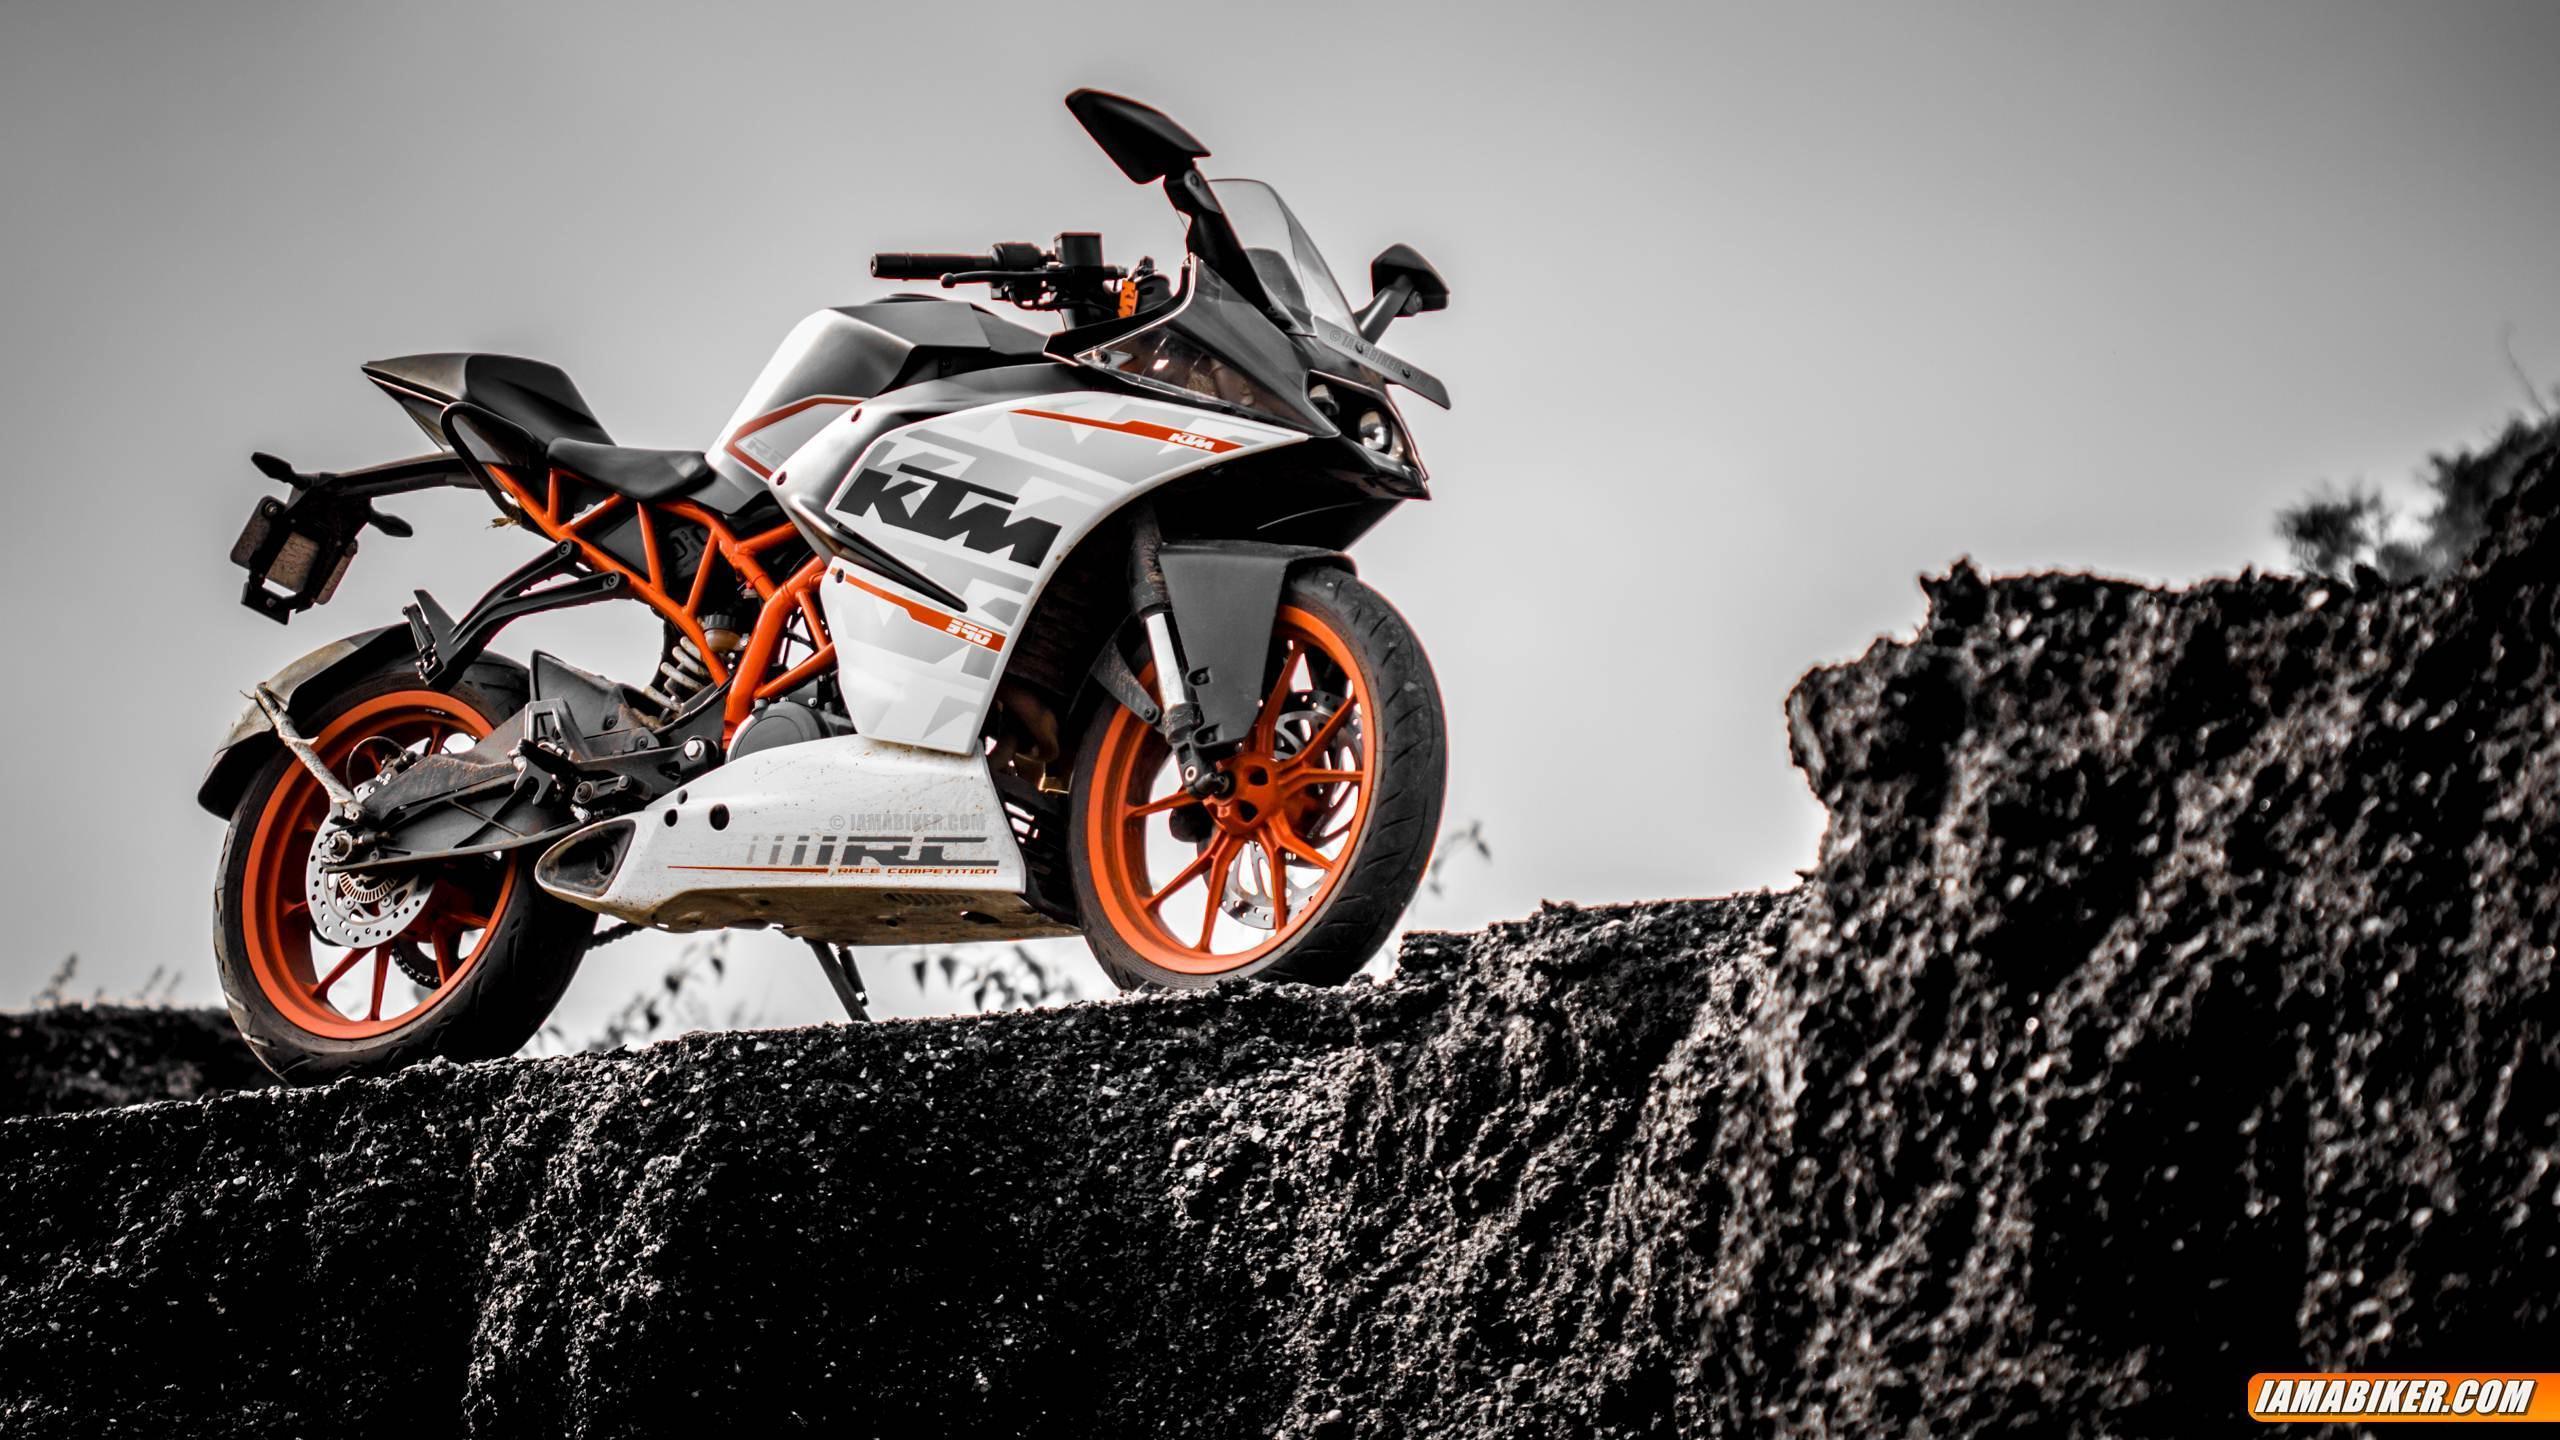 KTM Bike Wallpapers 2560x1440